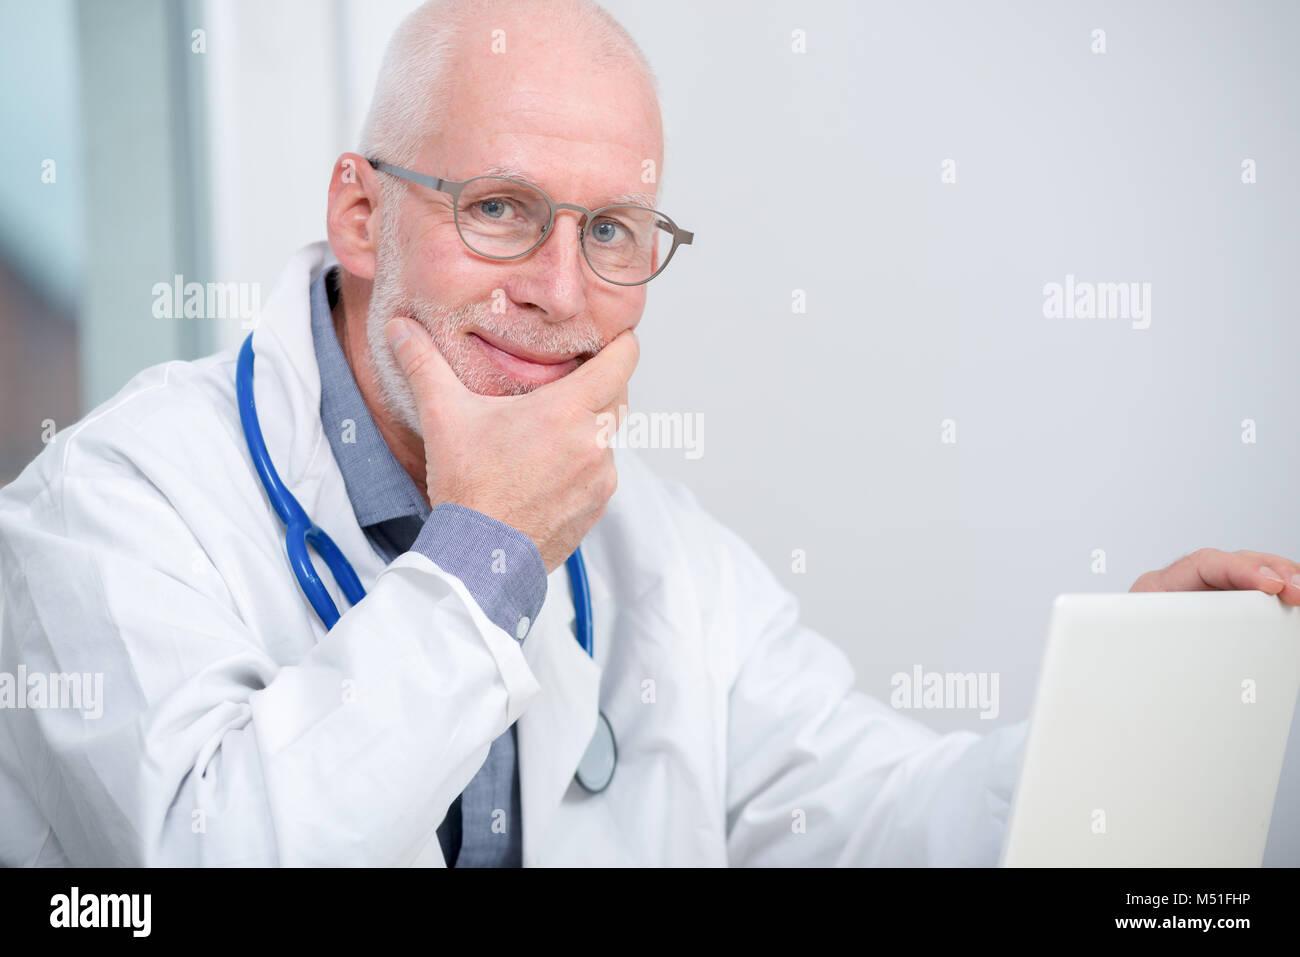 Mature health services